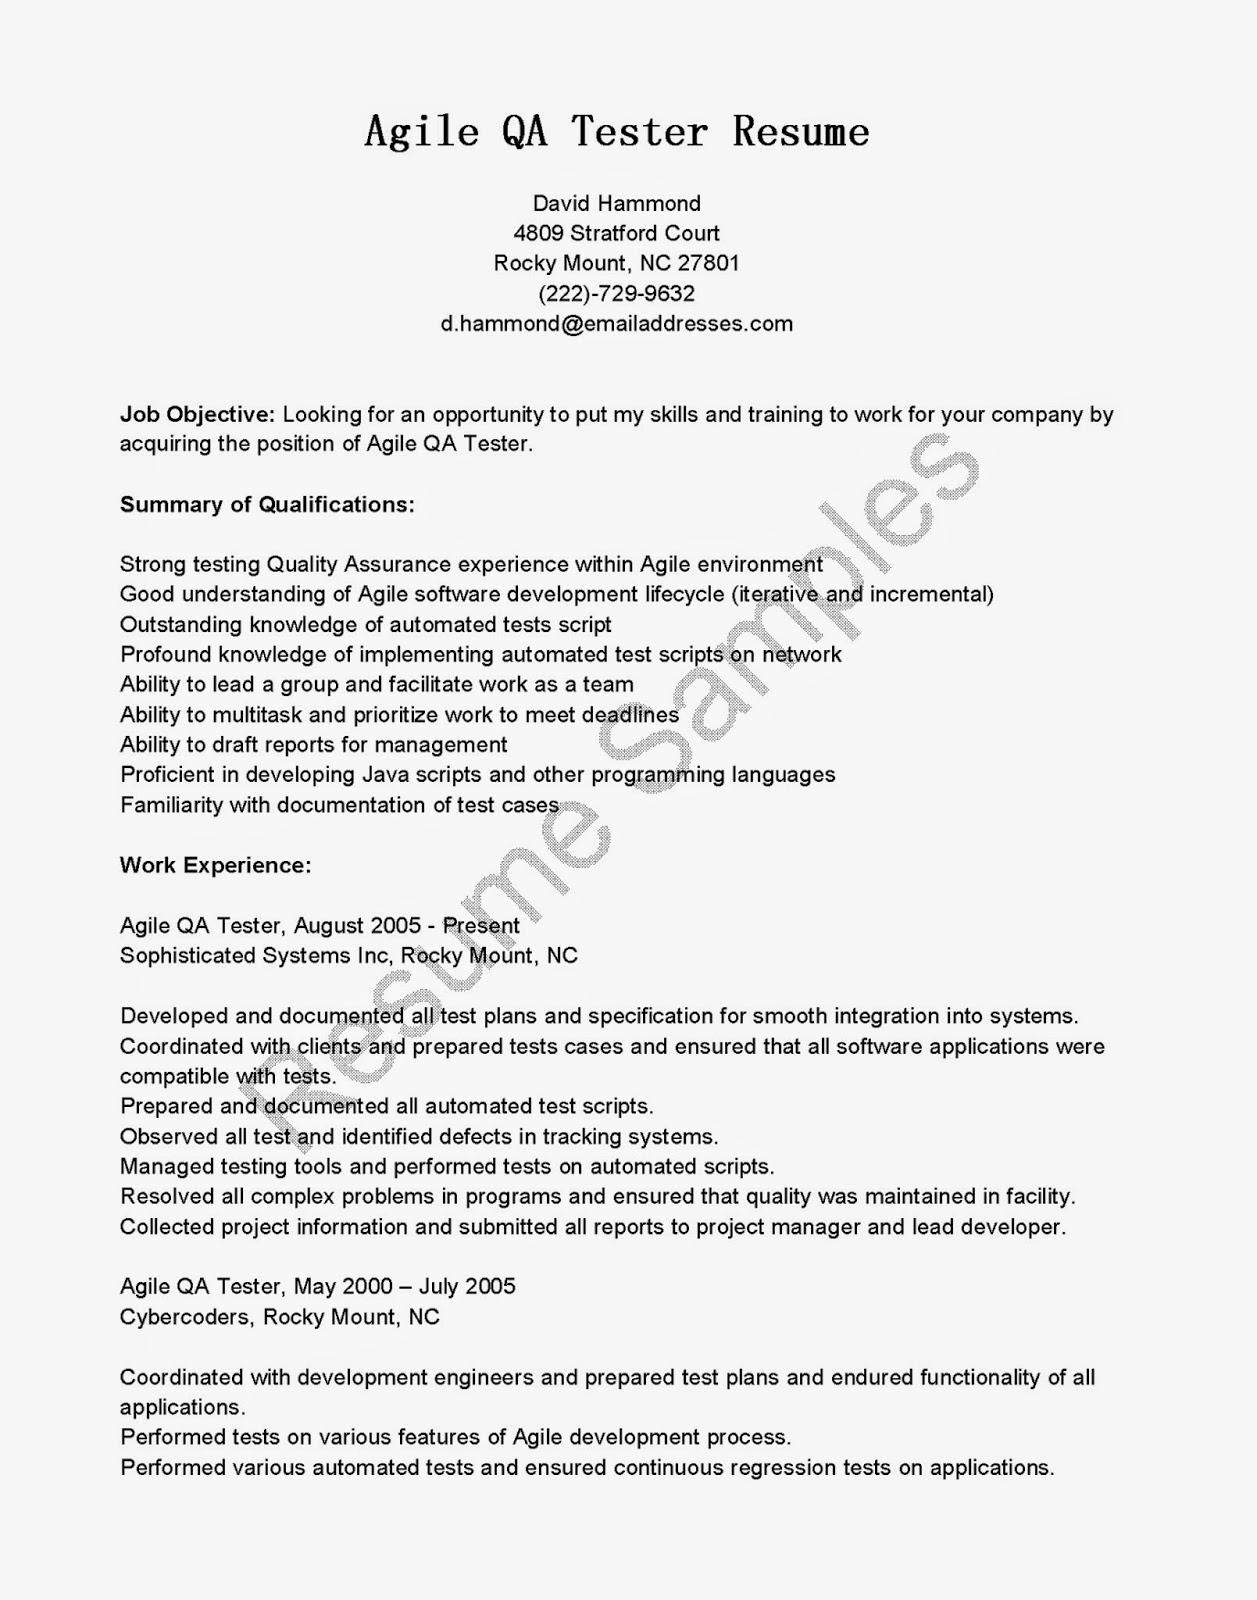 Resume Samples Agile Qa Tester